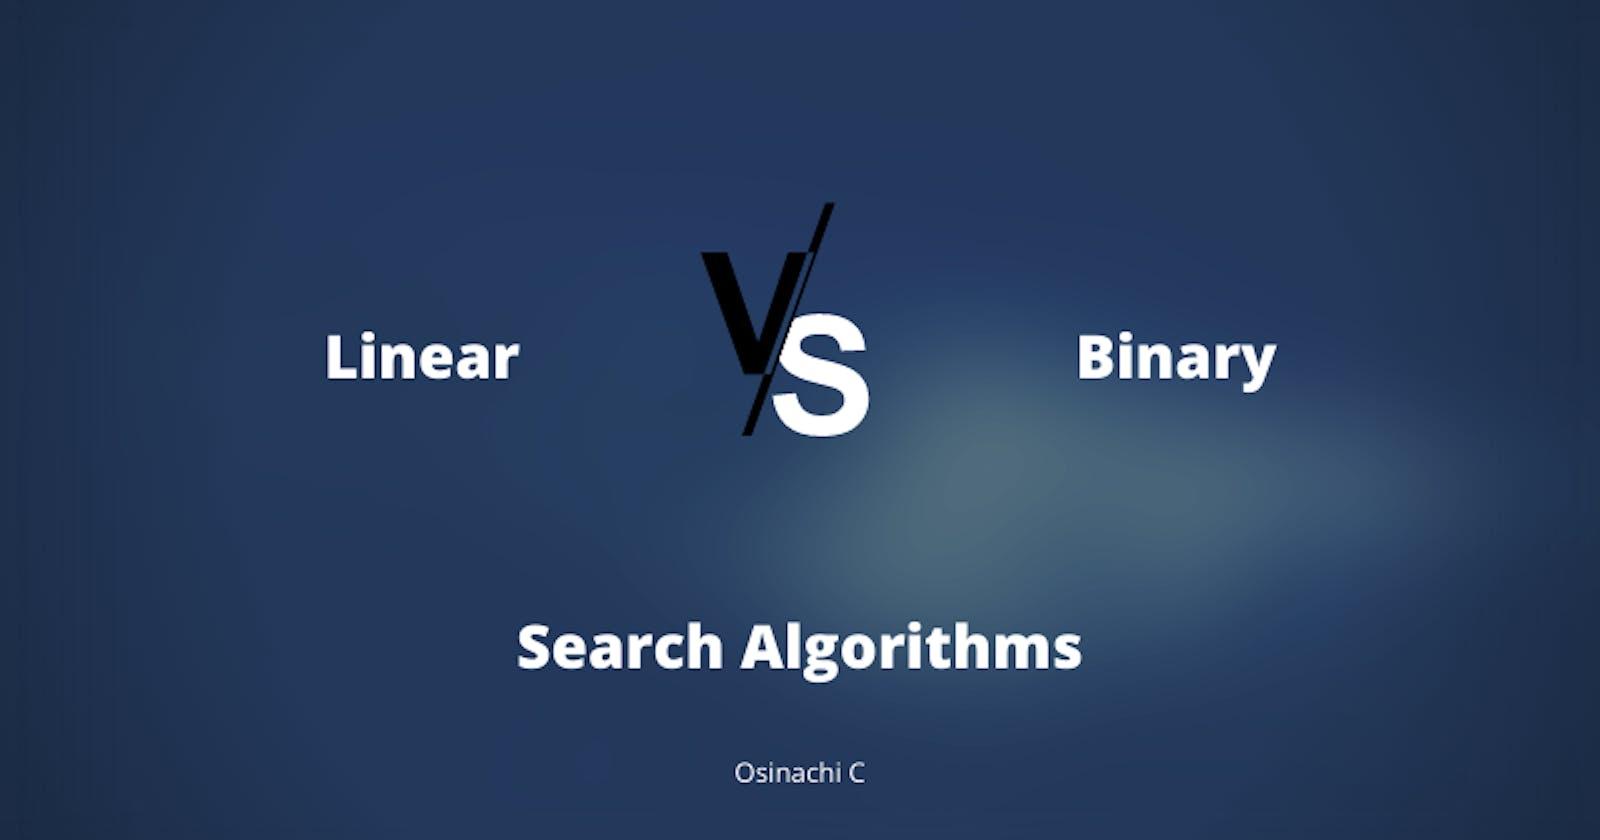 Linear vs Binary Search Algorithms